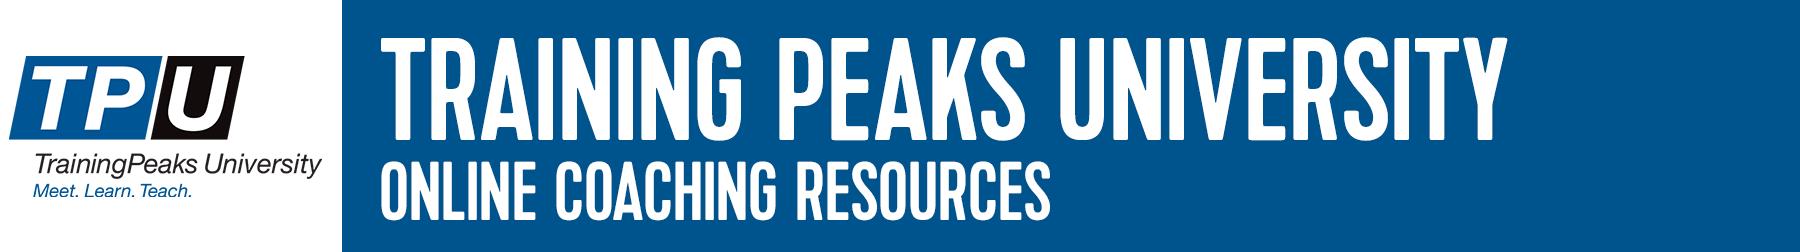 Training Peaks University Resources